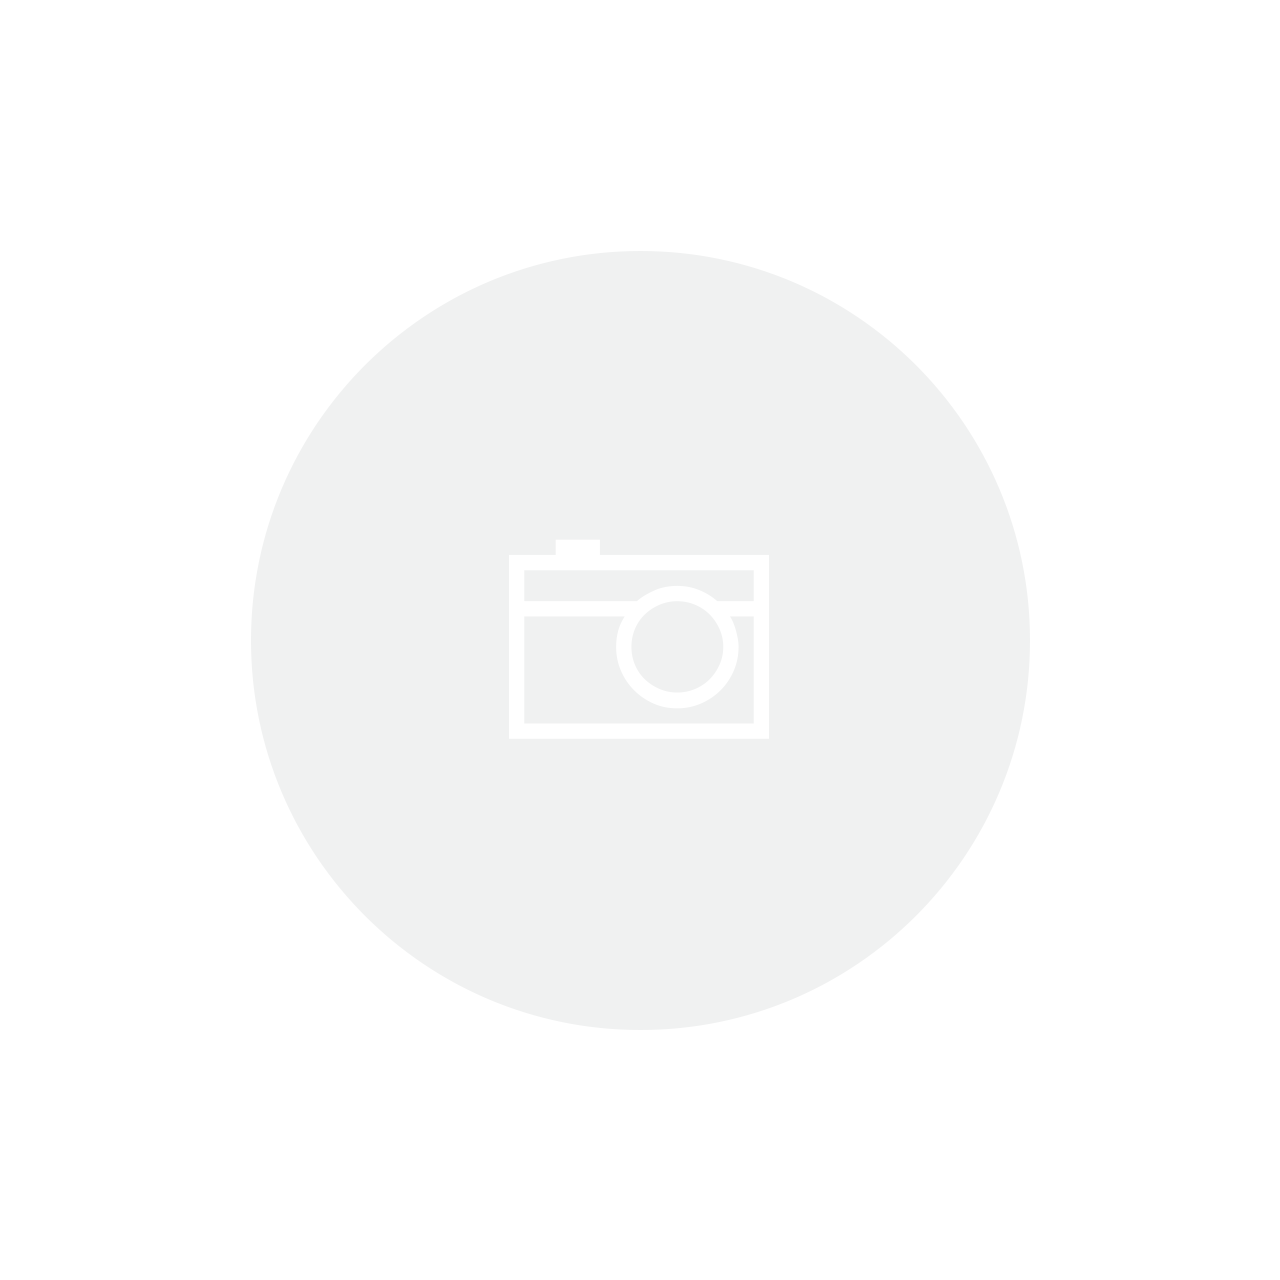 Faca Trinchante Inox 7' Churrasco Tramontina